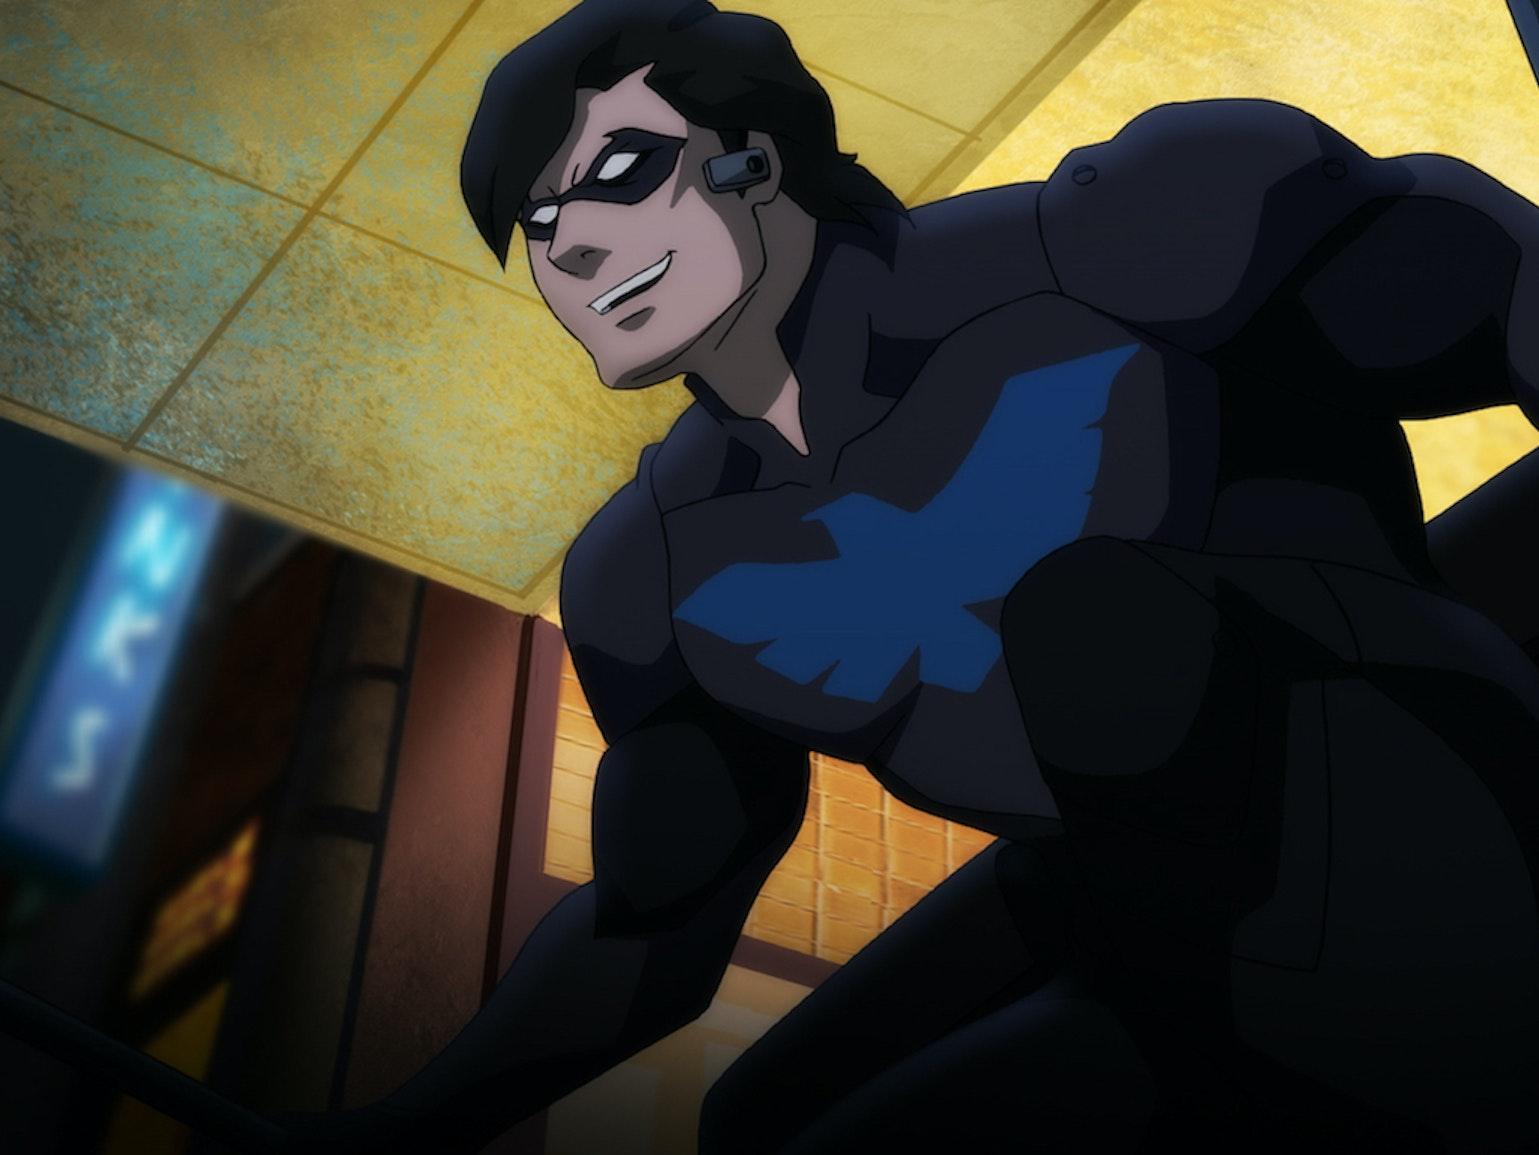 'Batman: Bad Blood' Director Jay Oliva Talks Shop on Future of DC Animation